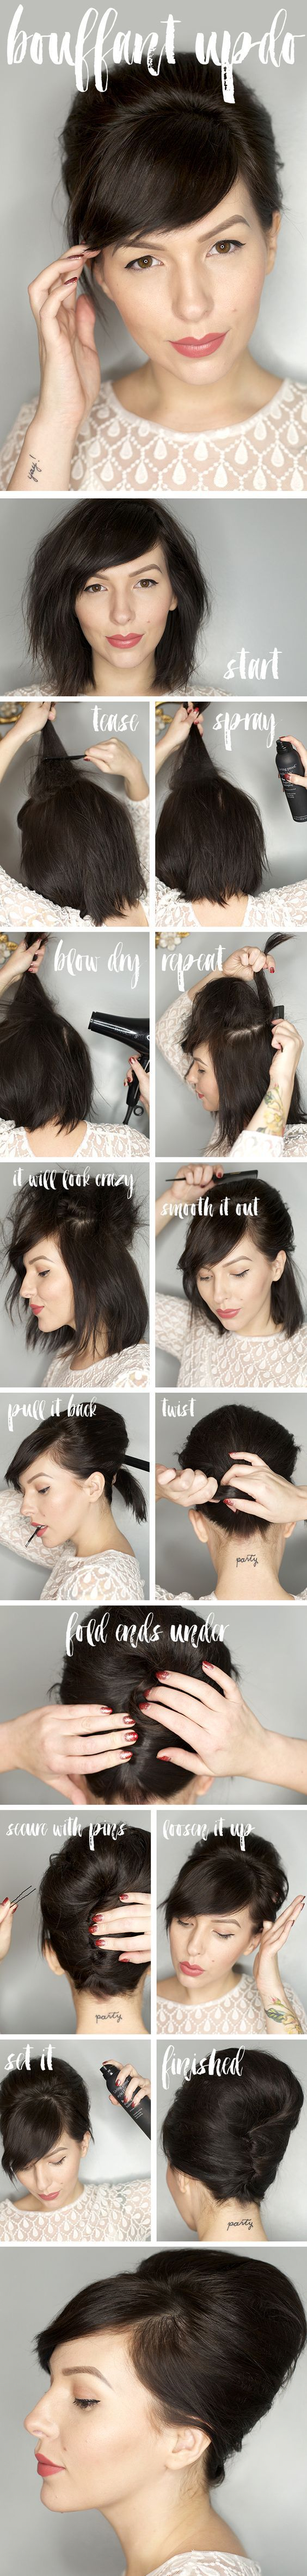 Bouffant Updo Hair Tutorial   keiko lynn   Bloglovin':